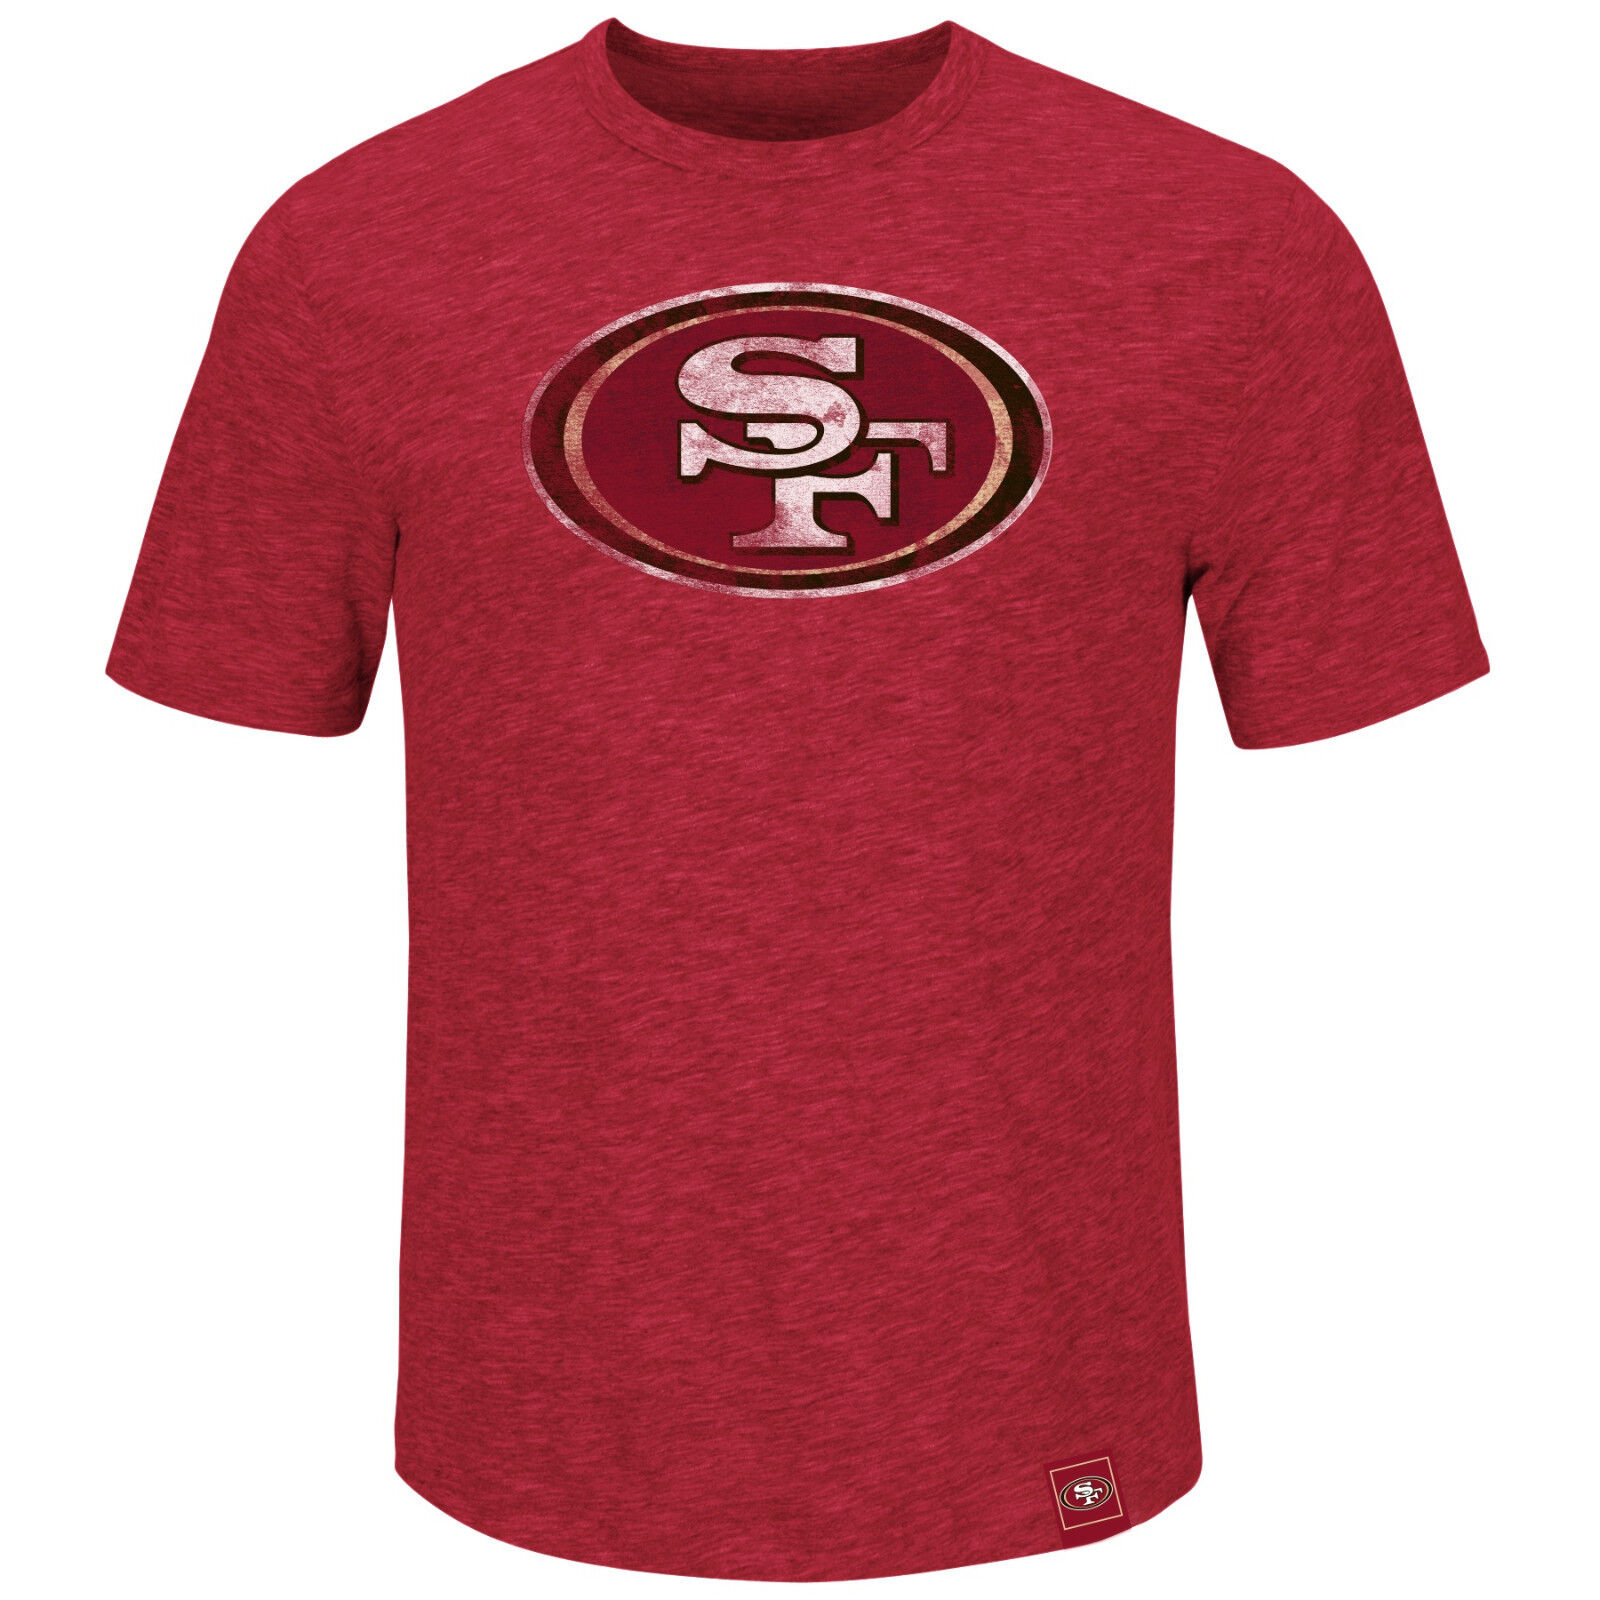 NFL FOOTBALL T-SHIRT SAN FRANCISCO 49ers LOGO HYPER Slub di MAJESTIC